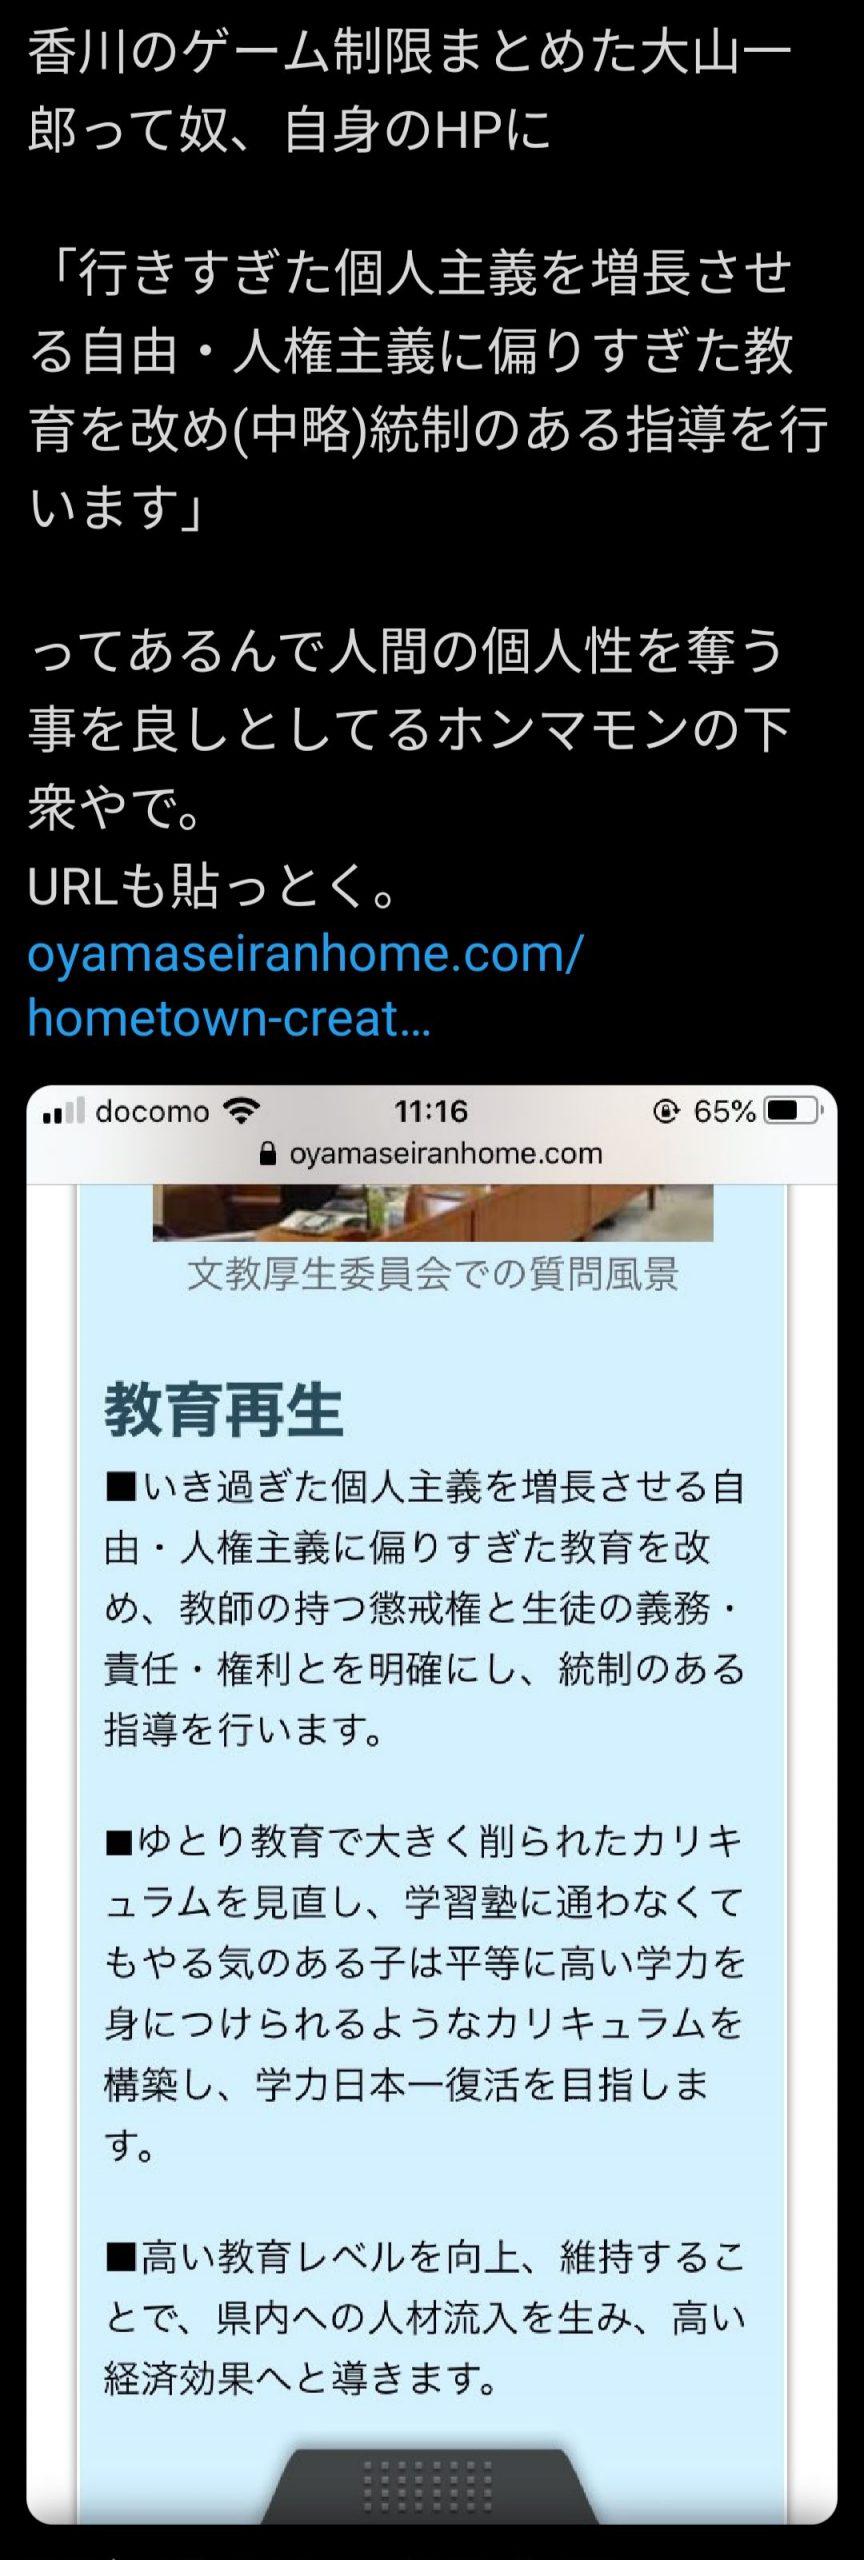 3 11 scaled - 香川県議会、ゲーム1日60分まで条例が可決成立